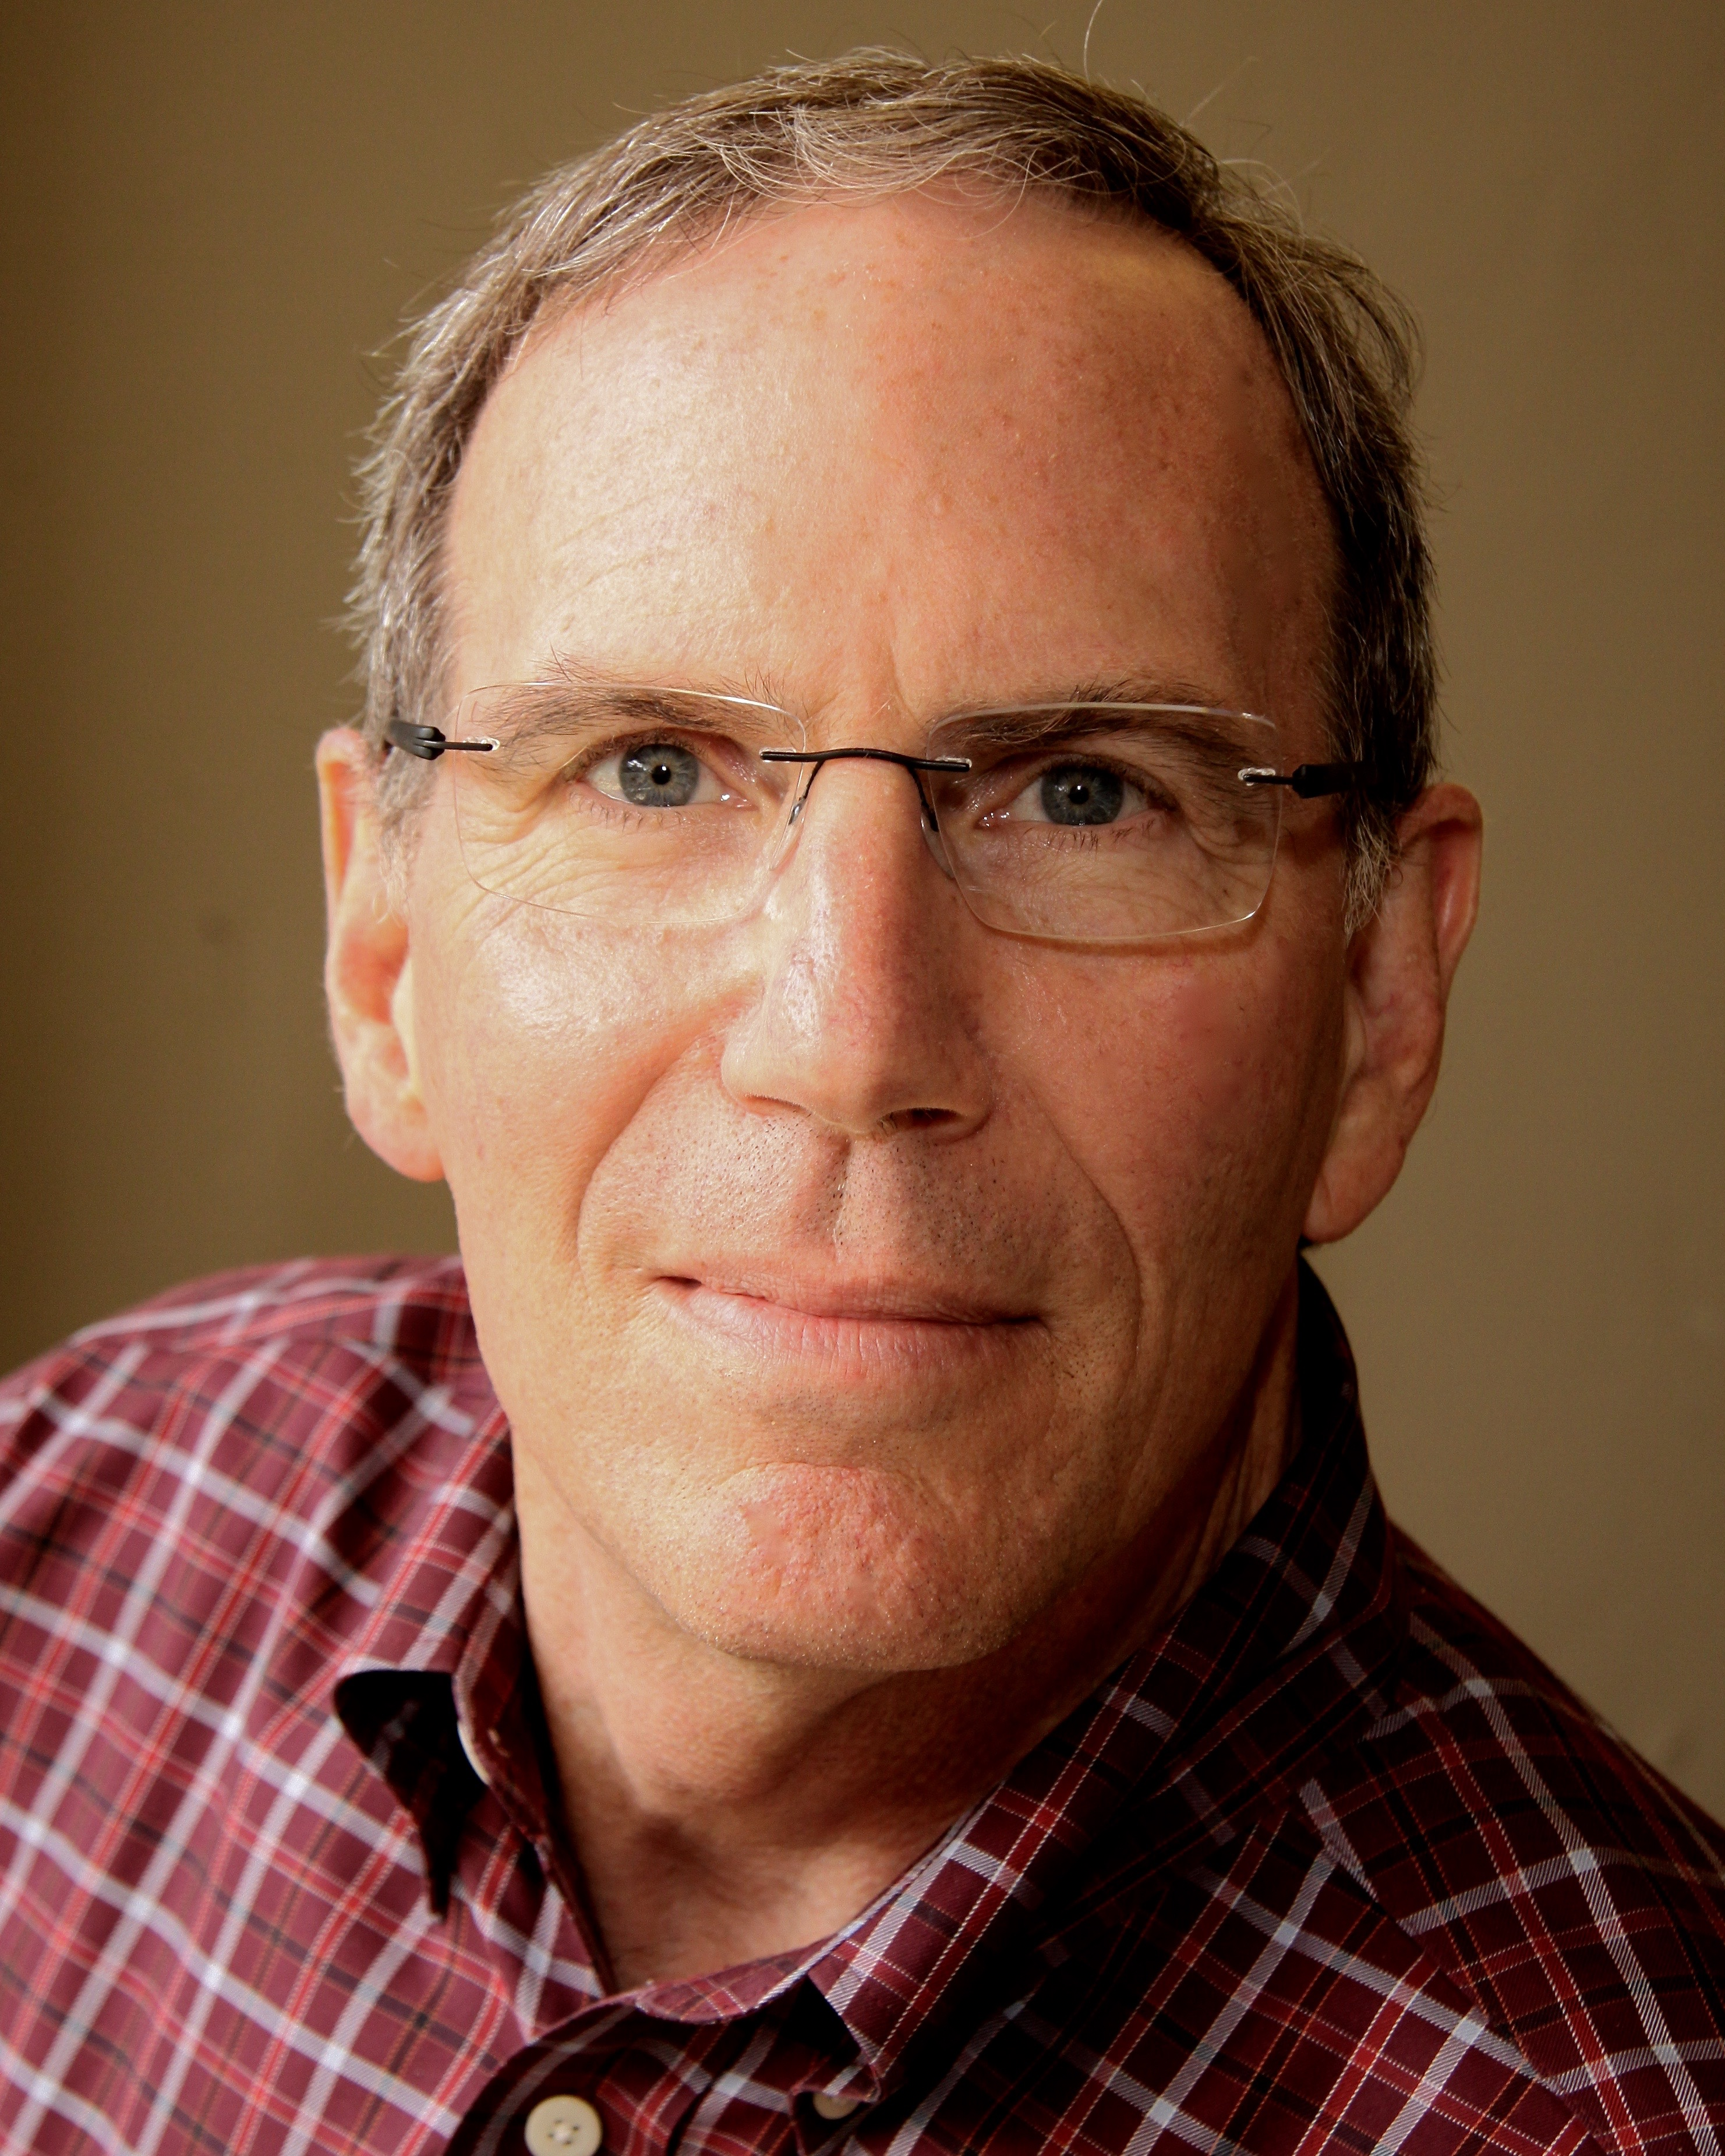 Daniel Birman